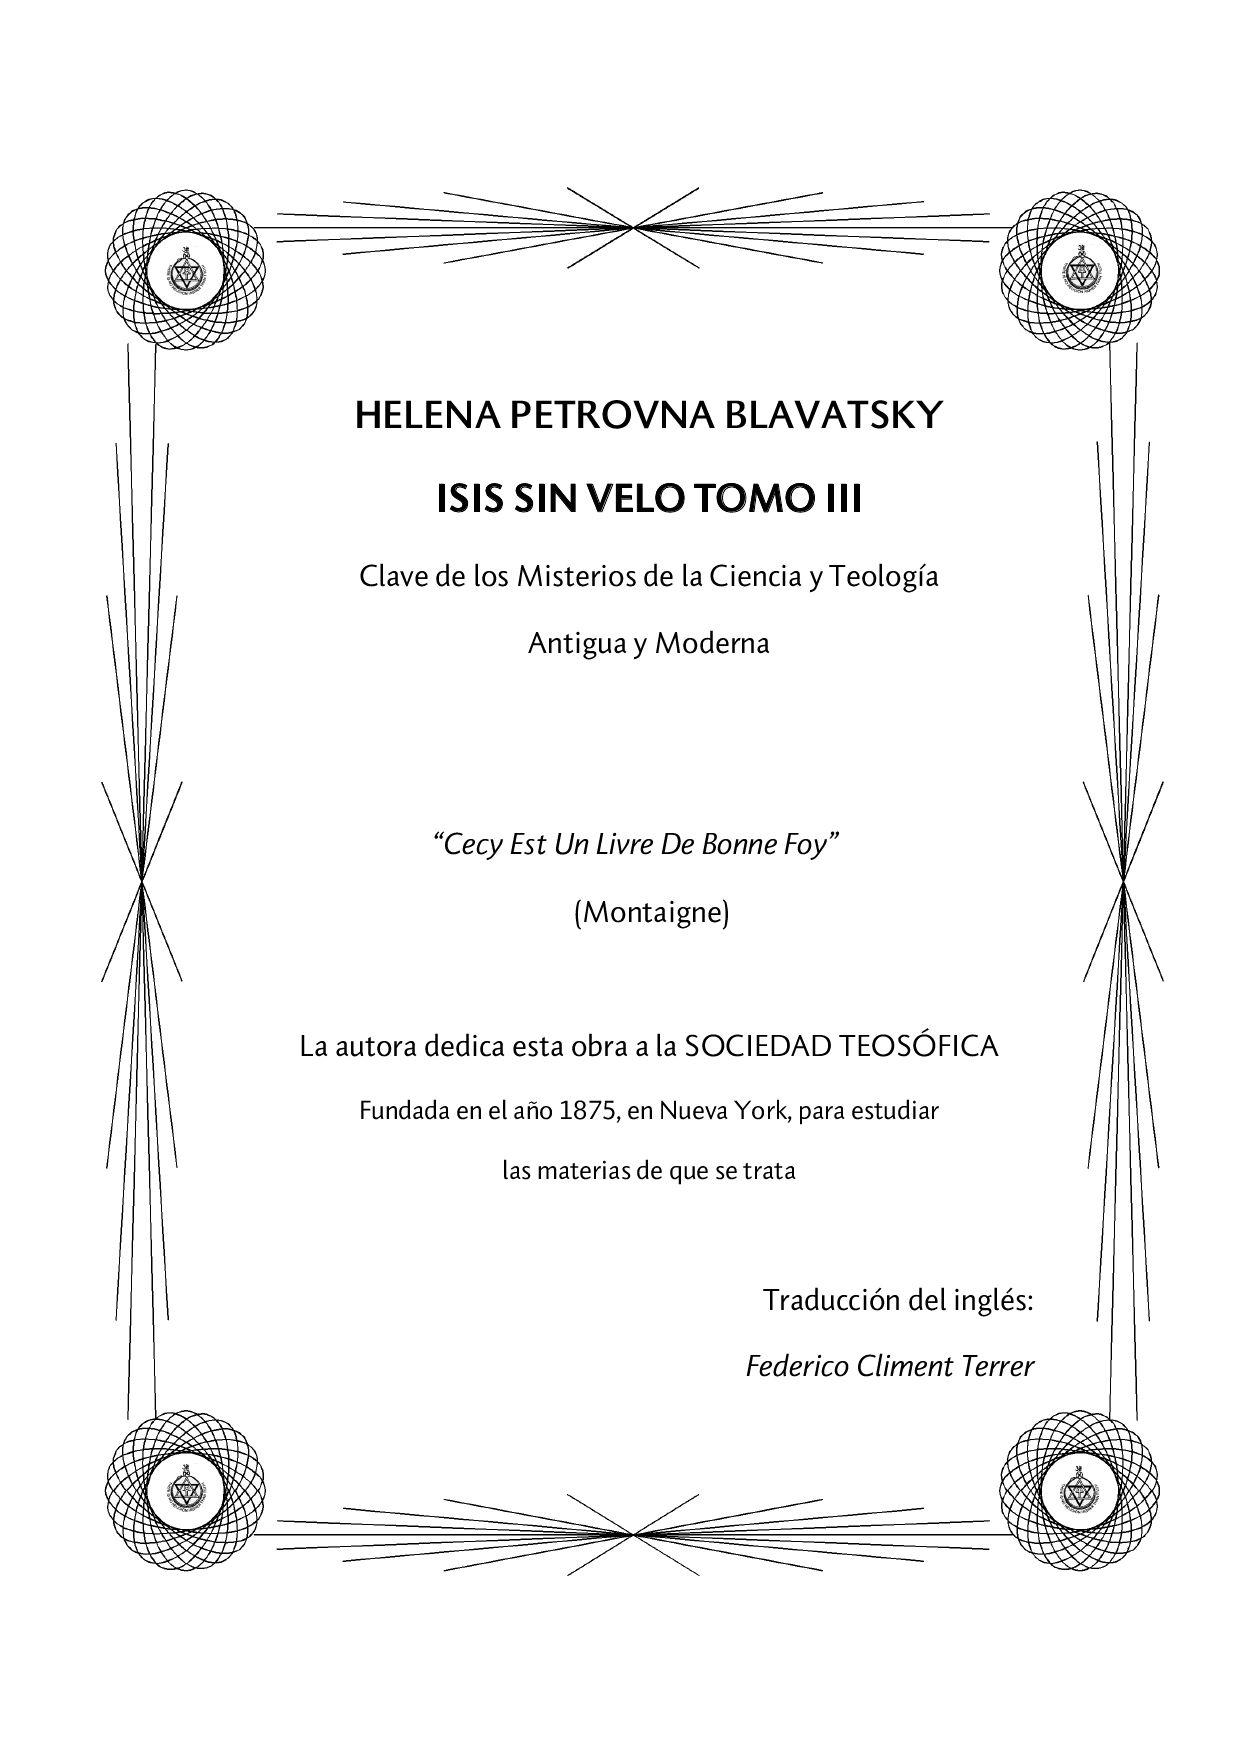 Isis sin velo Volumen III by Pedro Quilez - issuu